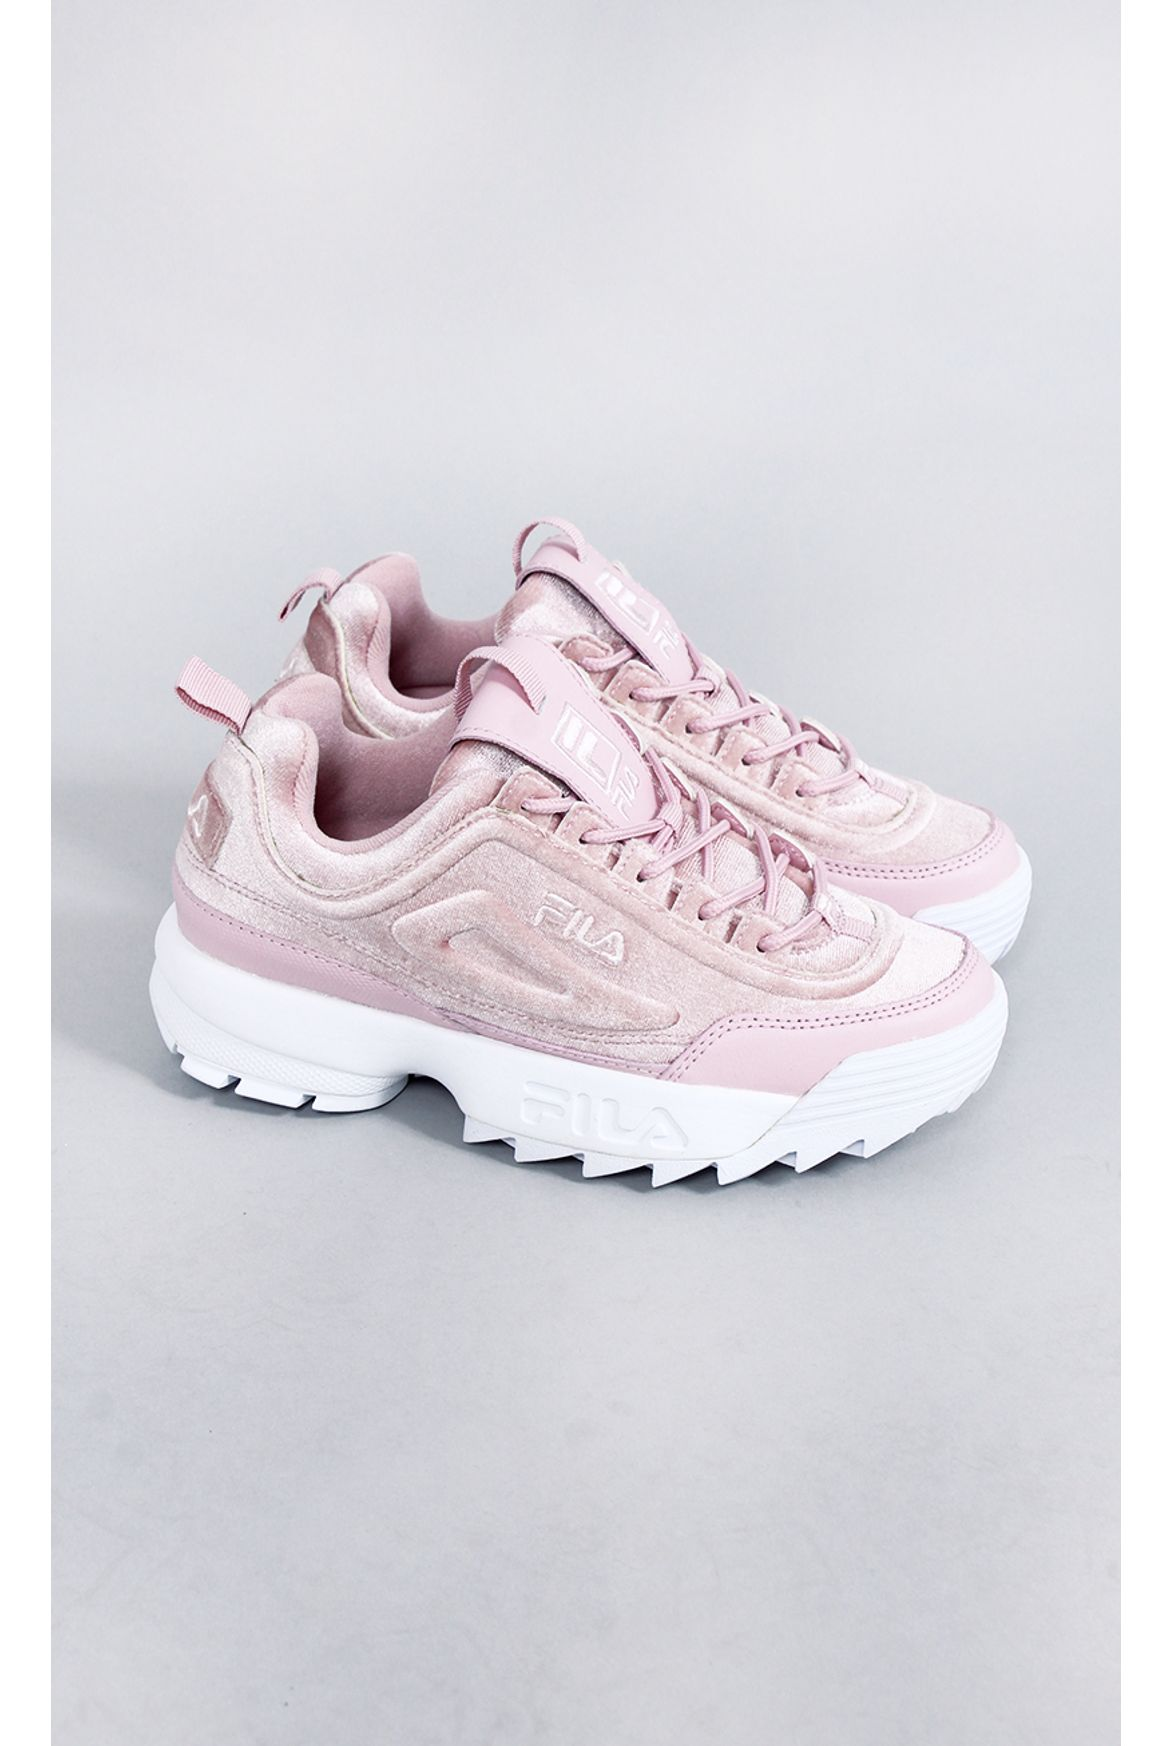 fe5afedd0 FSHN tênis fila disruptor II premium velour rosa - Fashion Closet